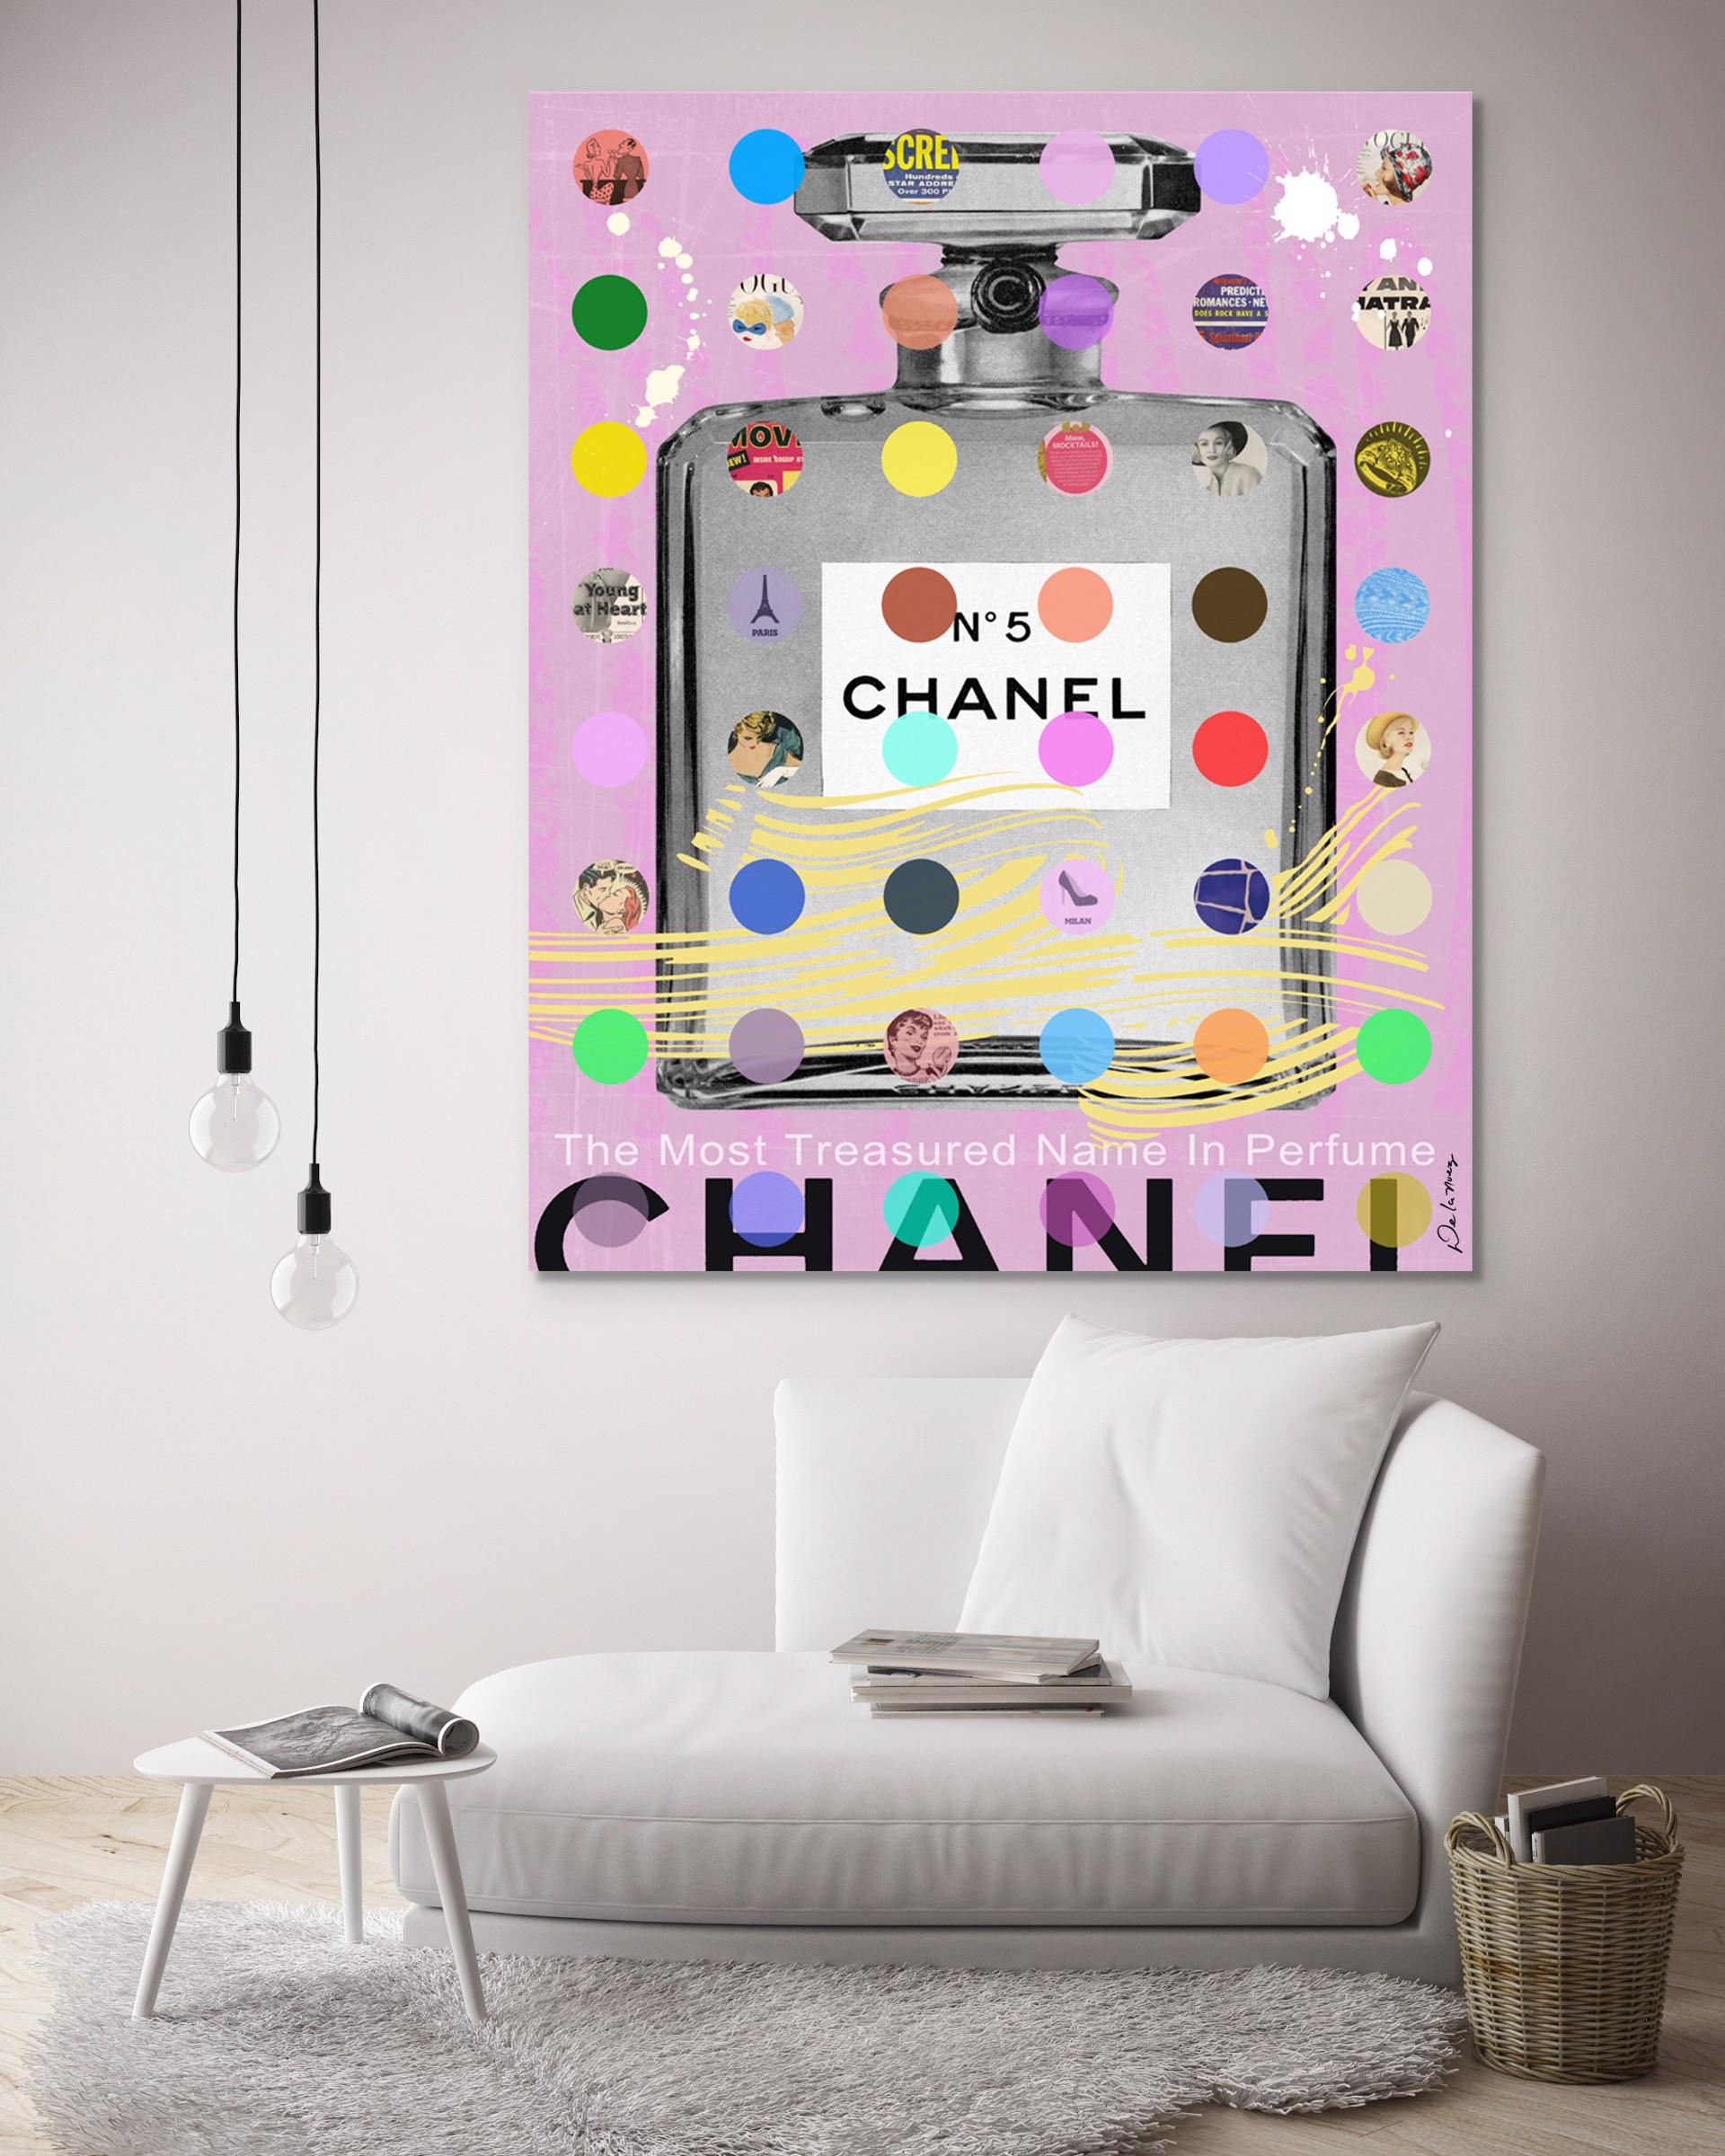 Chanel #5 Pink with Gray Bottle by Nelson De La Nuez